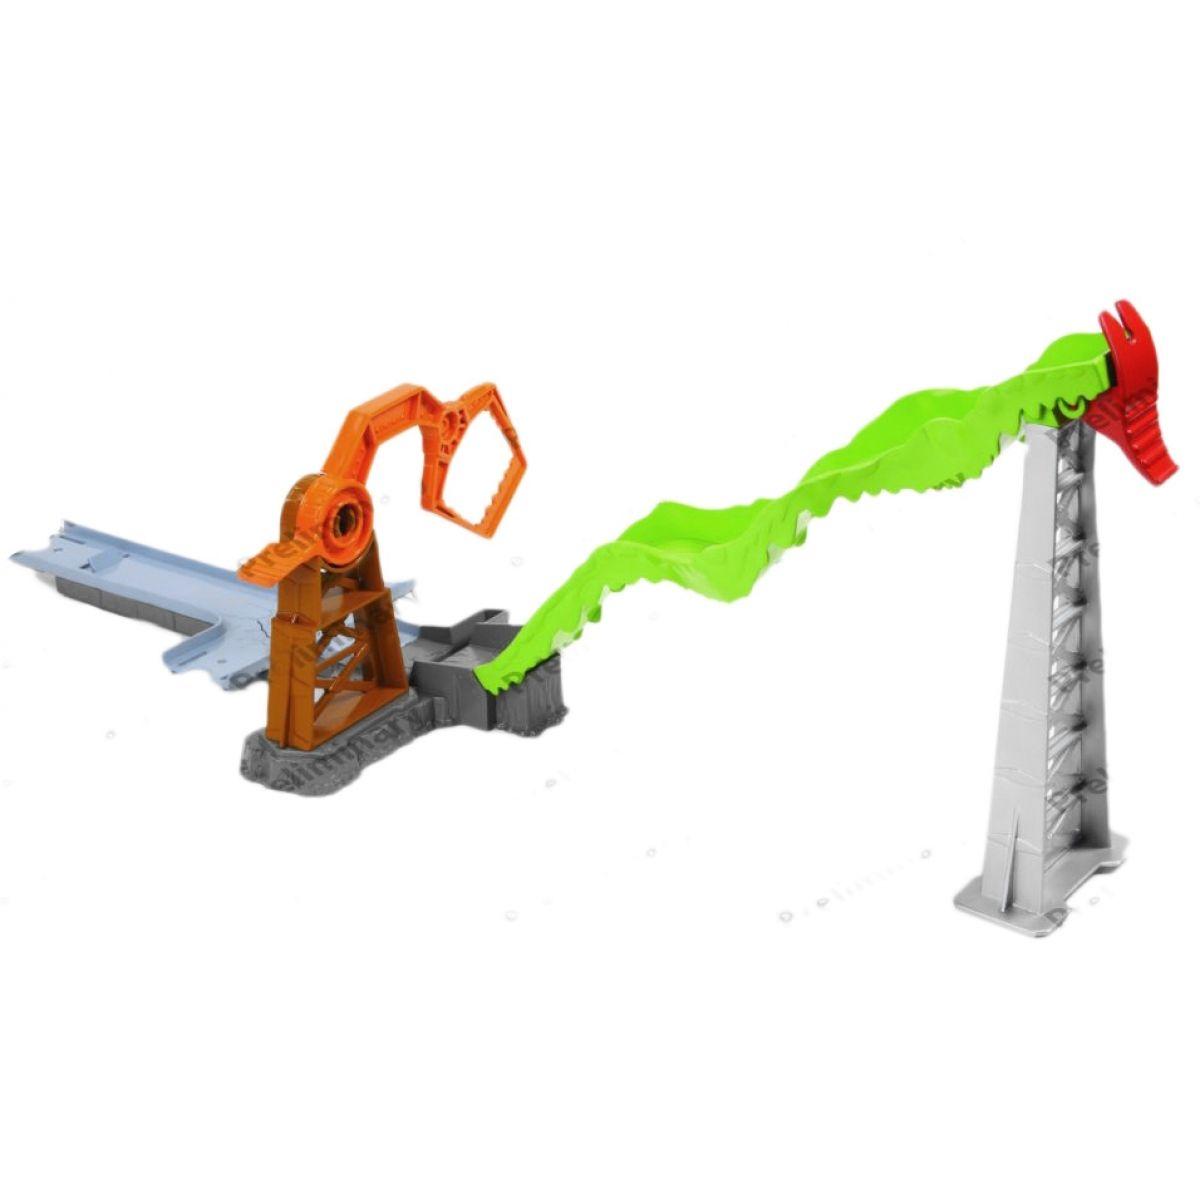 Hot Wheels - Děsivá léčka s mutanty - dráha (CDX95)